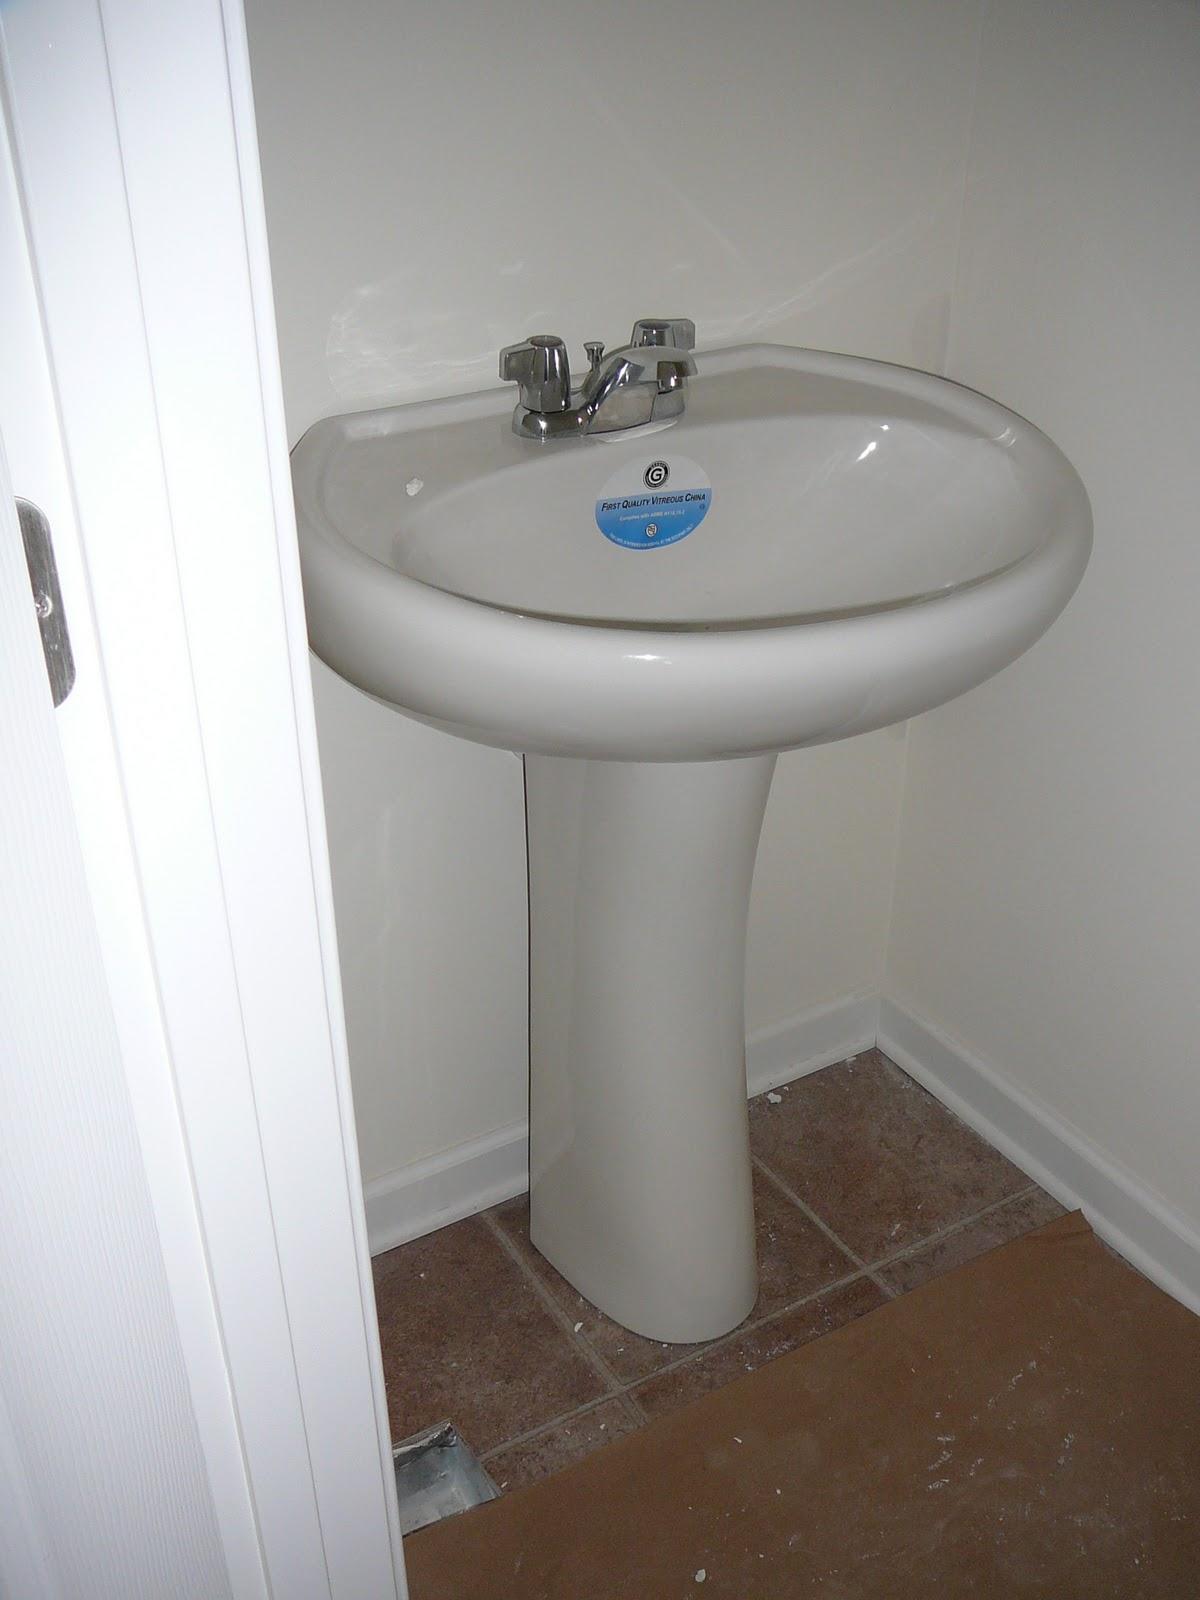 Http Moderninterior Id 2016 04 09 Bathroom Sinks At Lowes